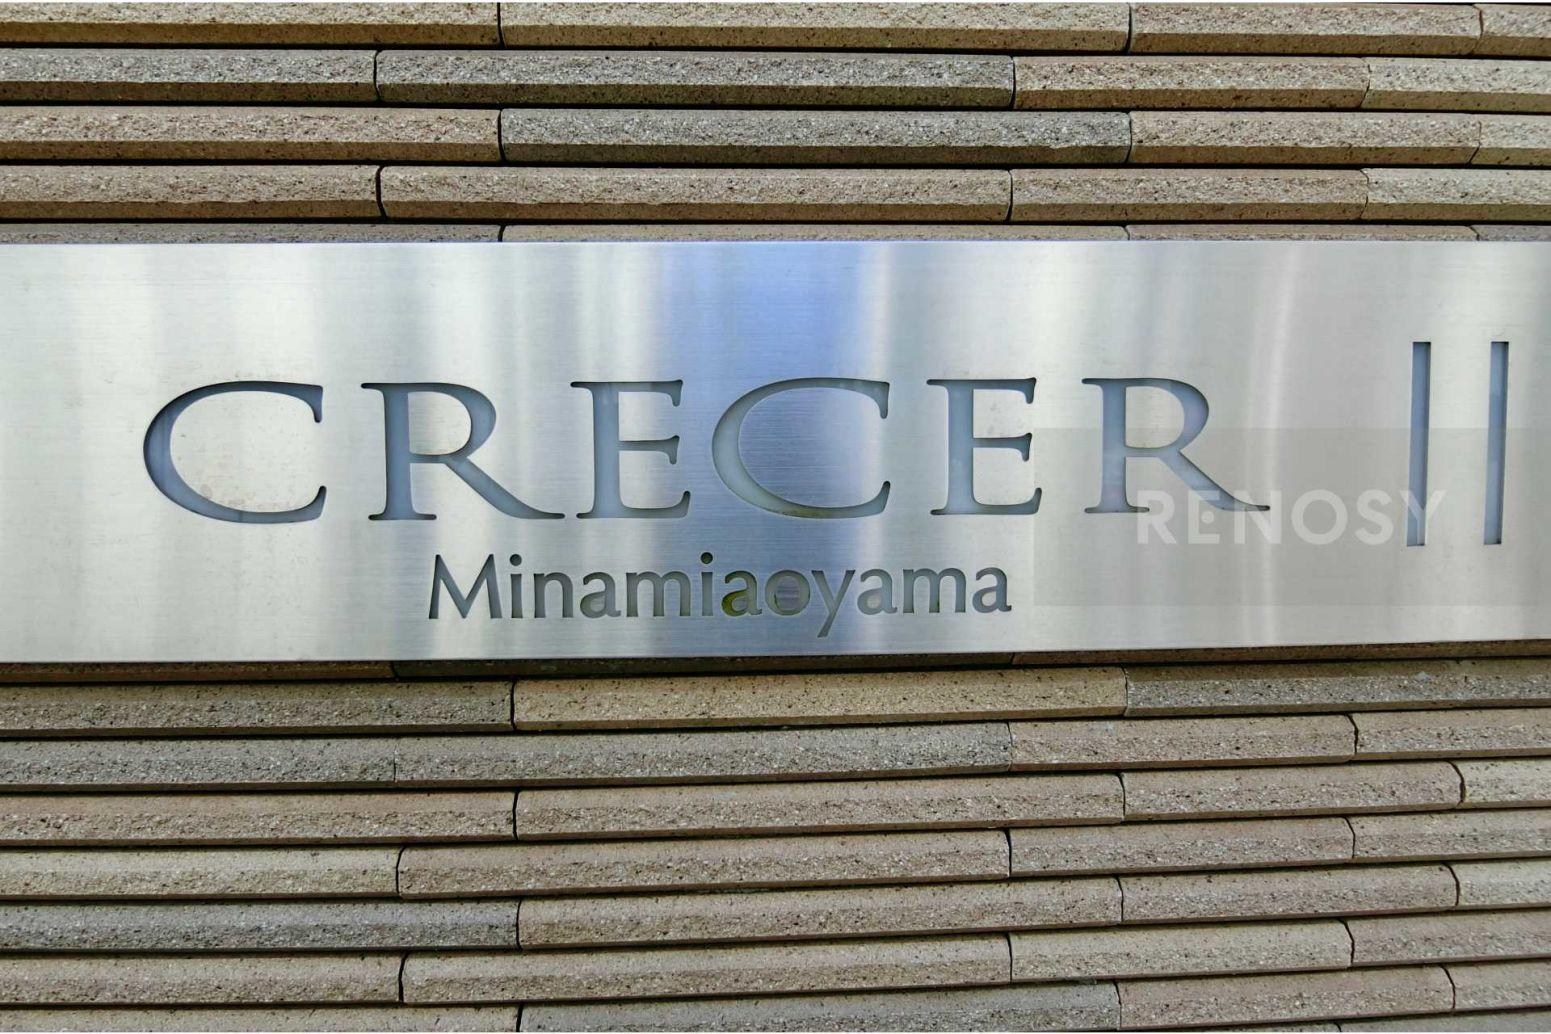 CRECER南青山